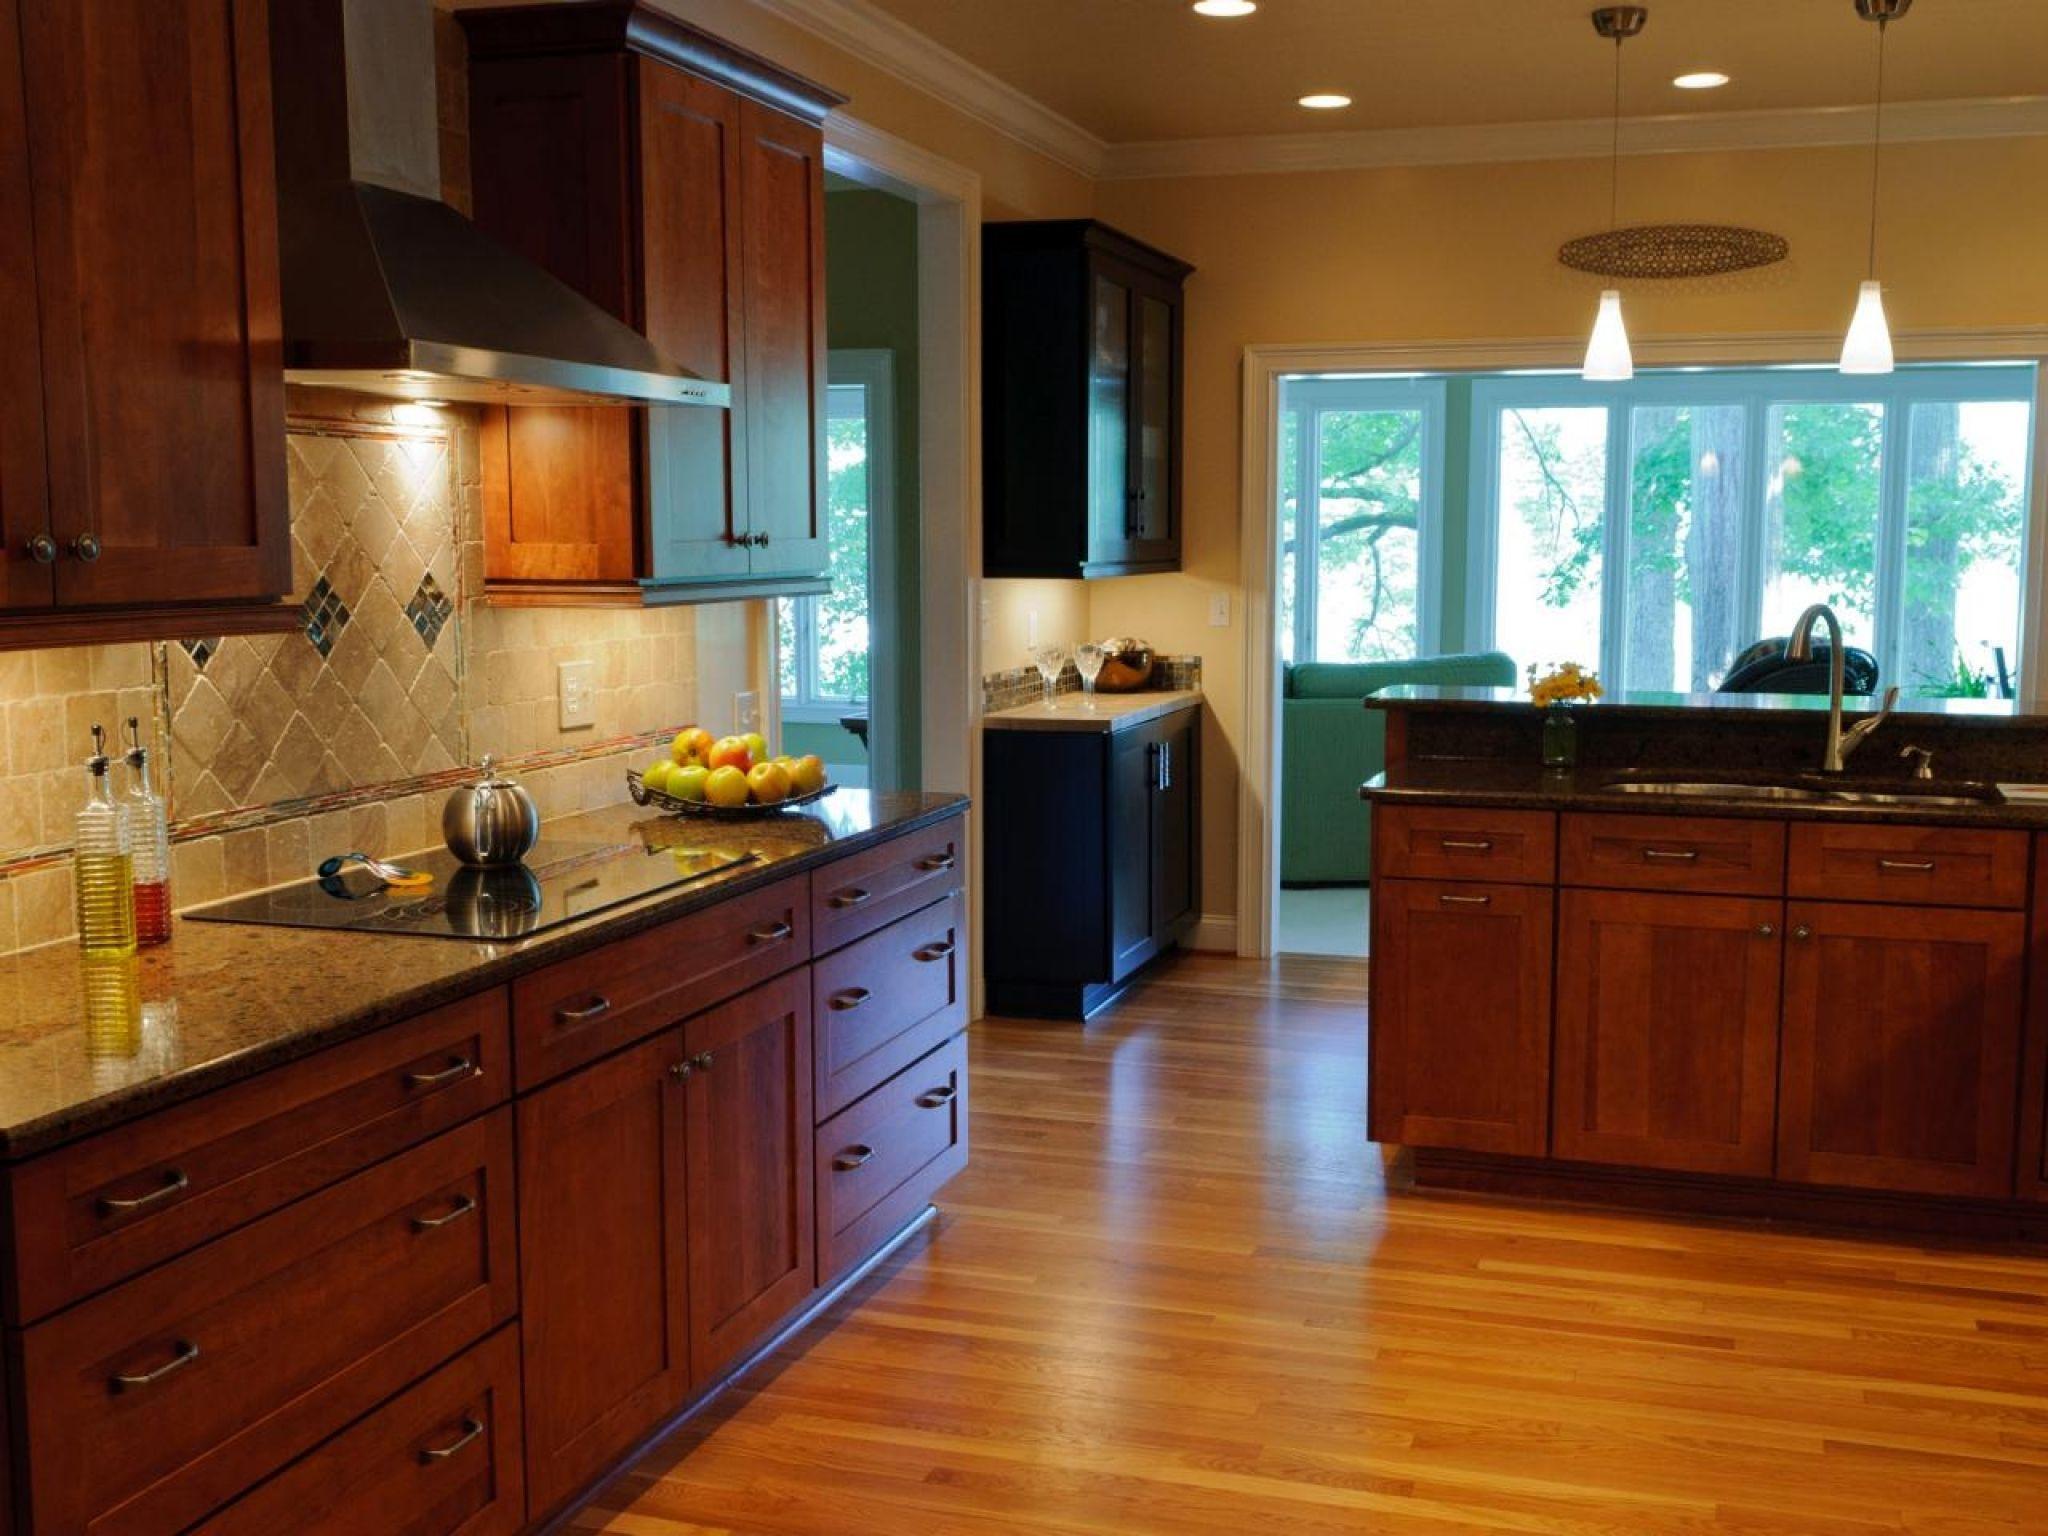 restain oak kitchen cabinets - kitchen remodel ideas for ...